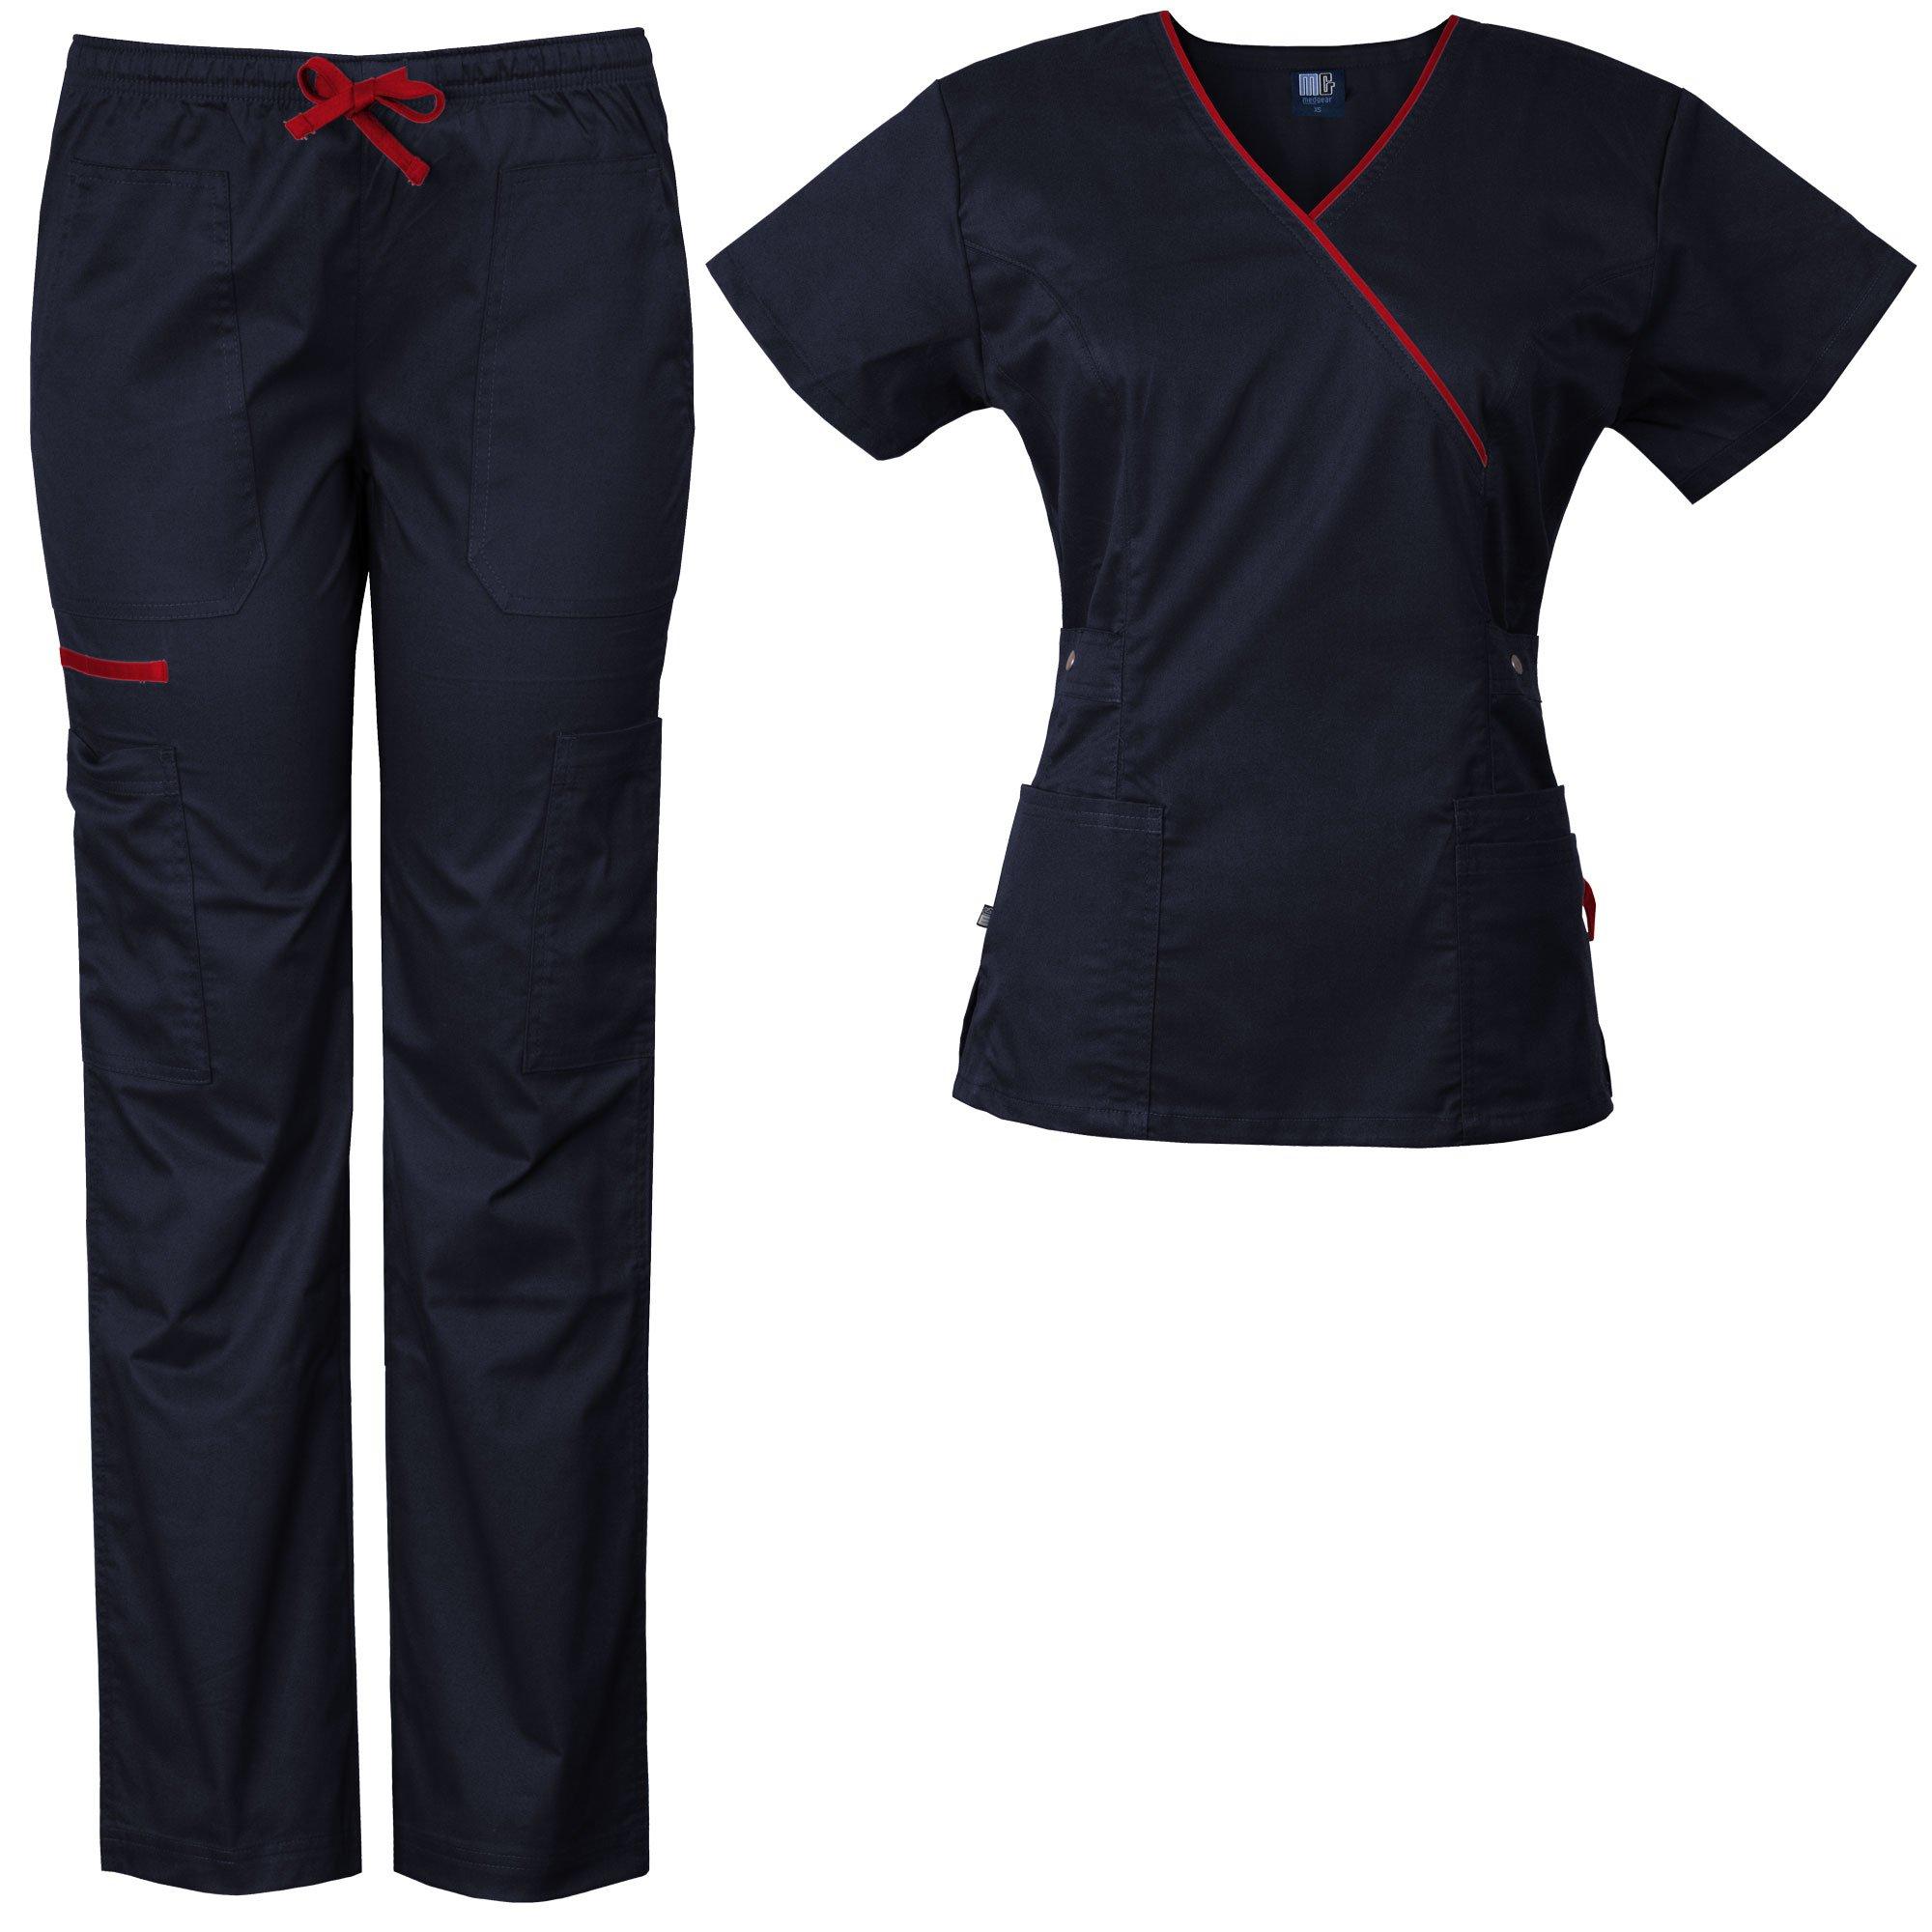 Medgear Women's Stretch Scrubs Set 5-Pocket Top & Multi-Pocket Pants (M, Midnight Blue)